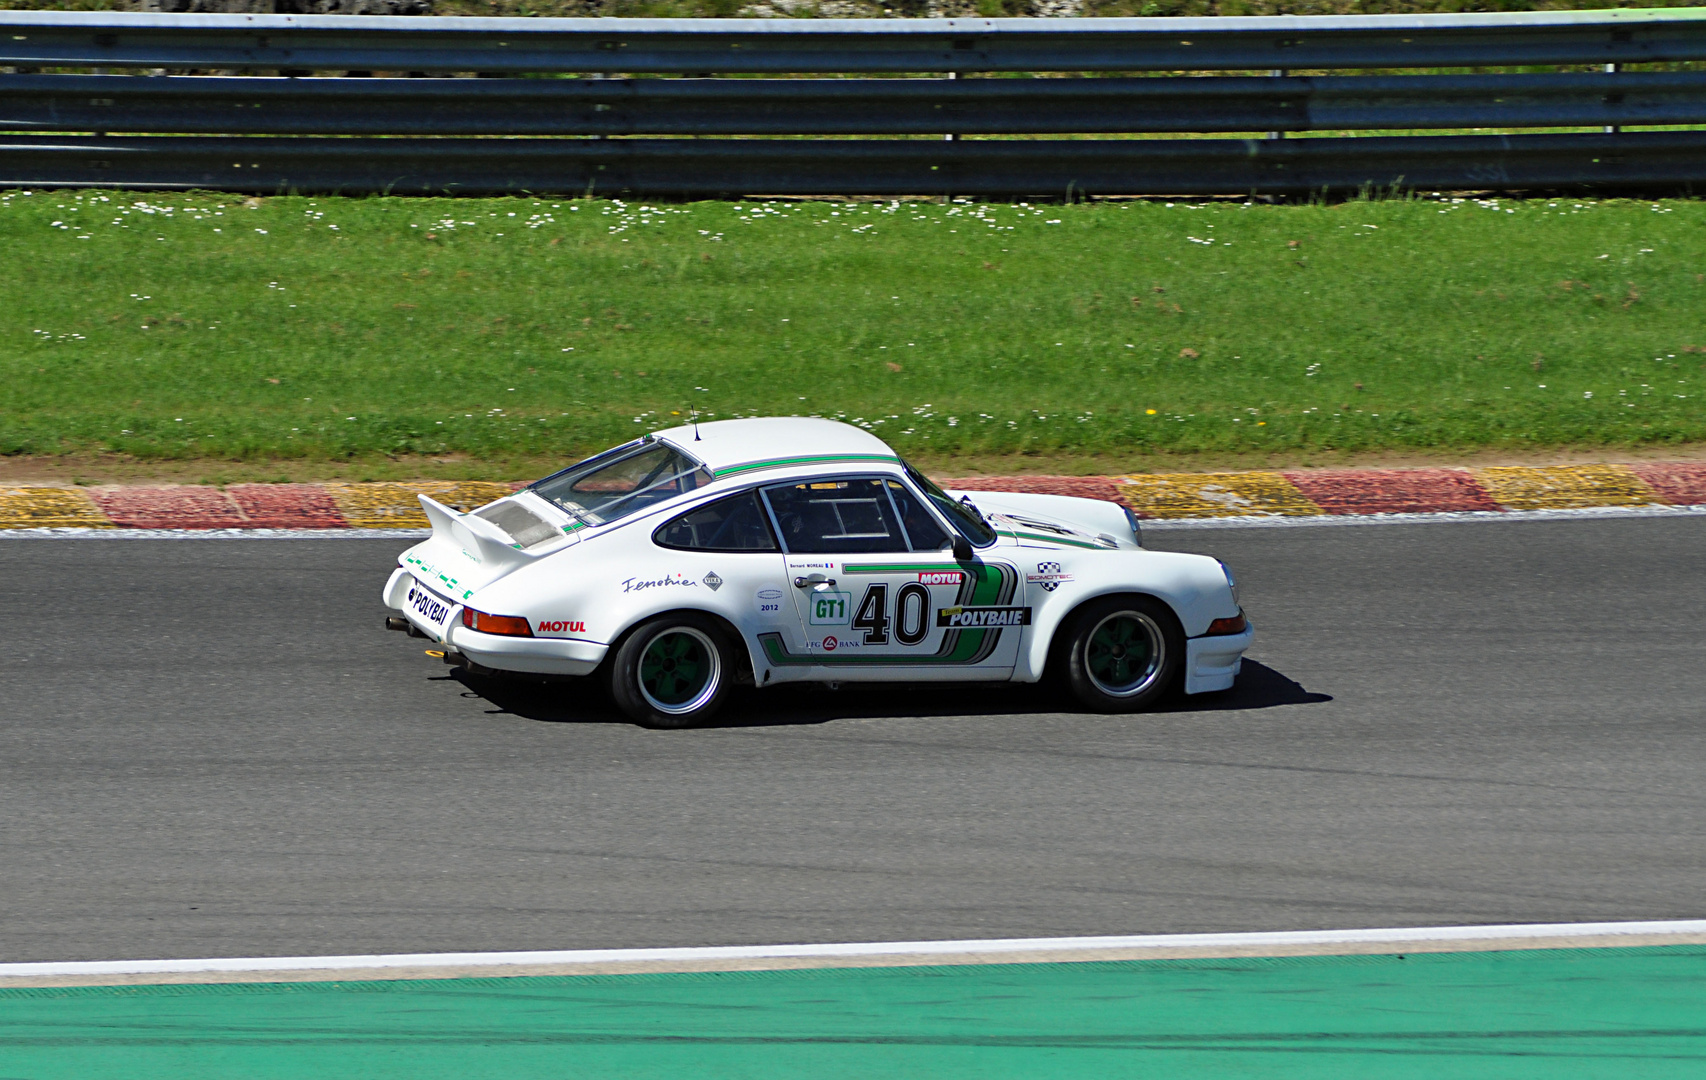 40 Porsche 911 RSR 2.8L Bj.1973